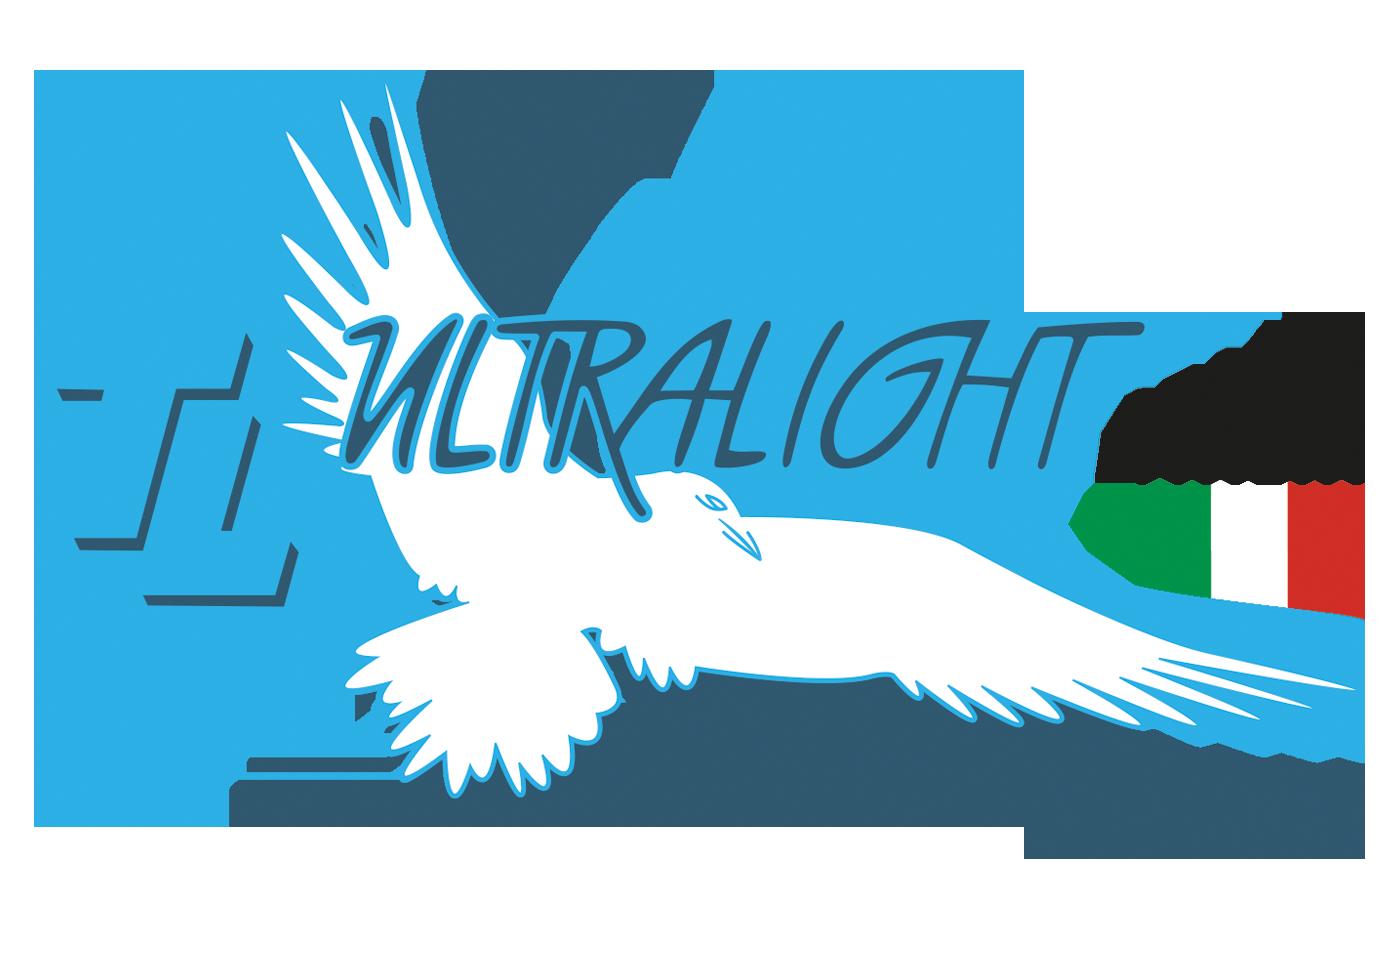 Tl-ultralight